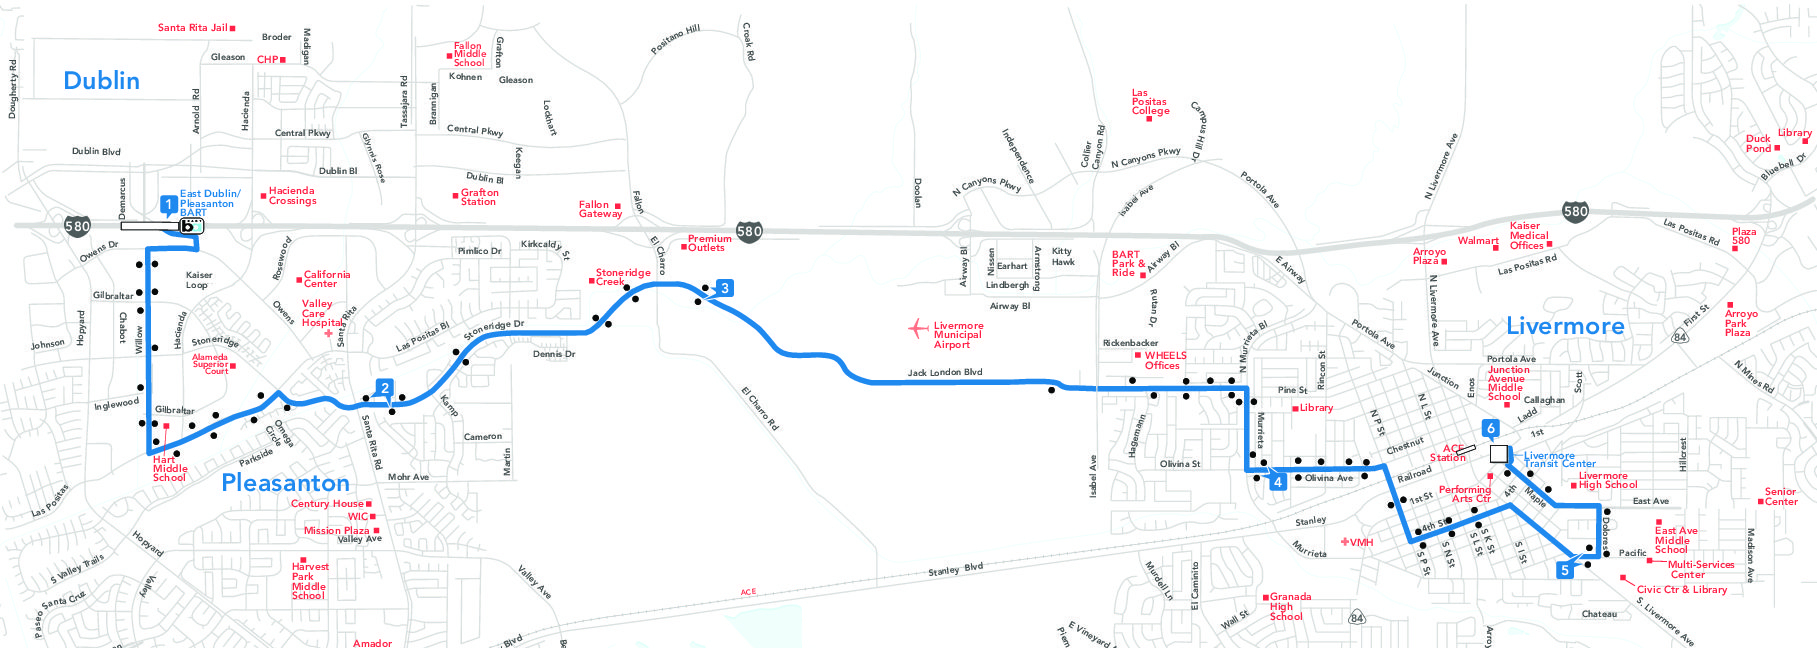 Bike Lanes Trails Map Dublin Ca Official Website In California - Map Of Dublin California Area